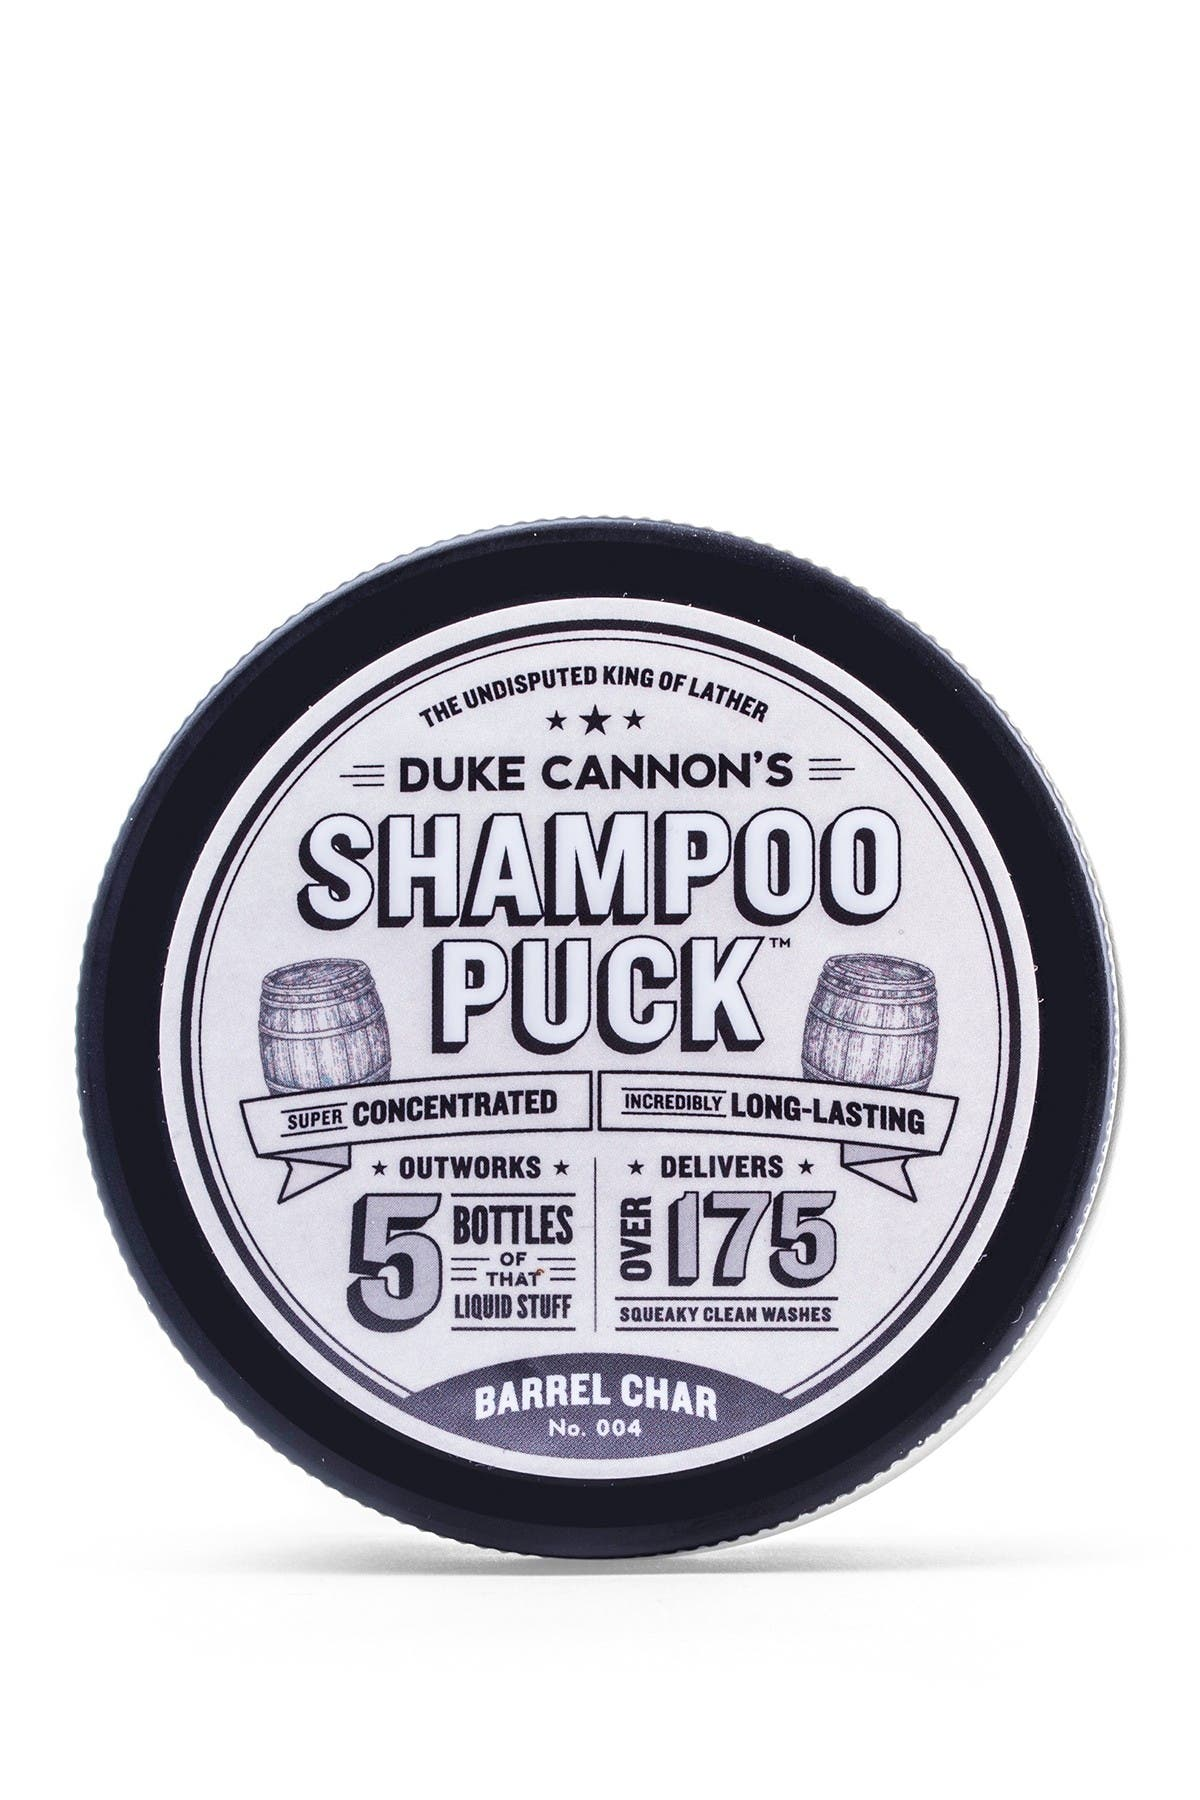 Image of DUKE CANNON Shampoo Puck - Barrel Char